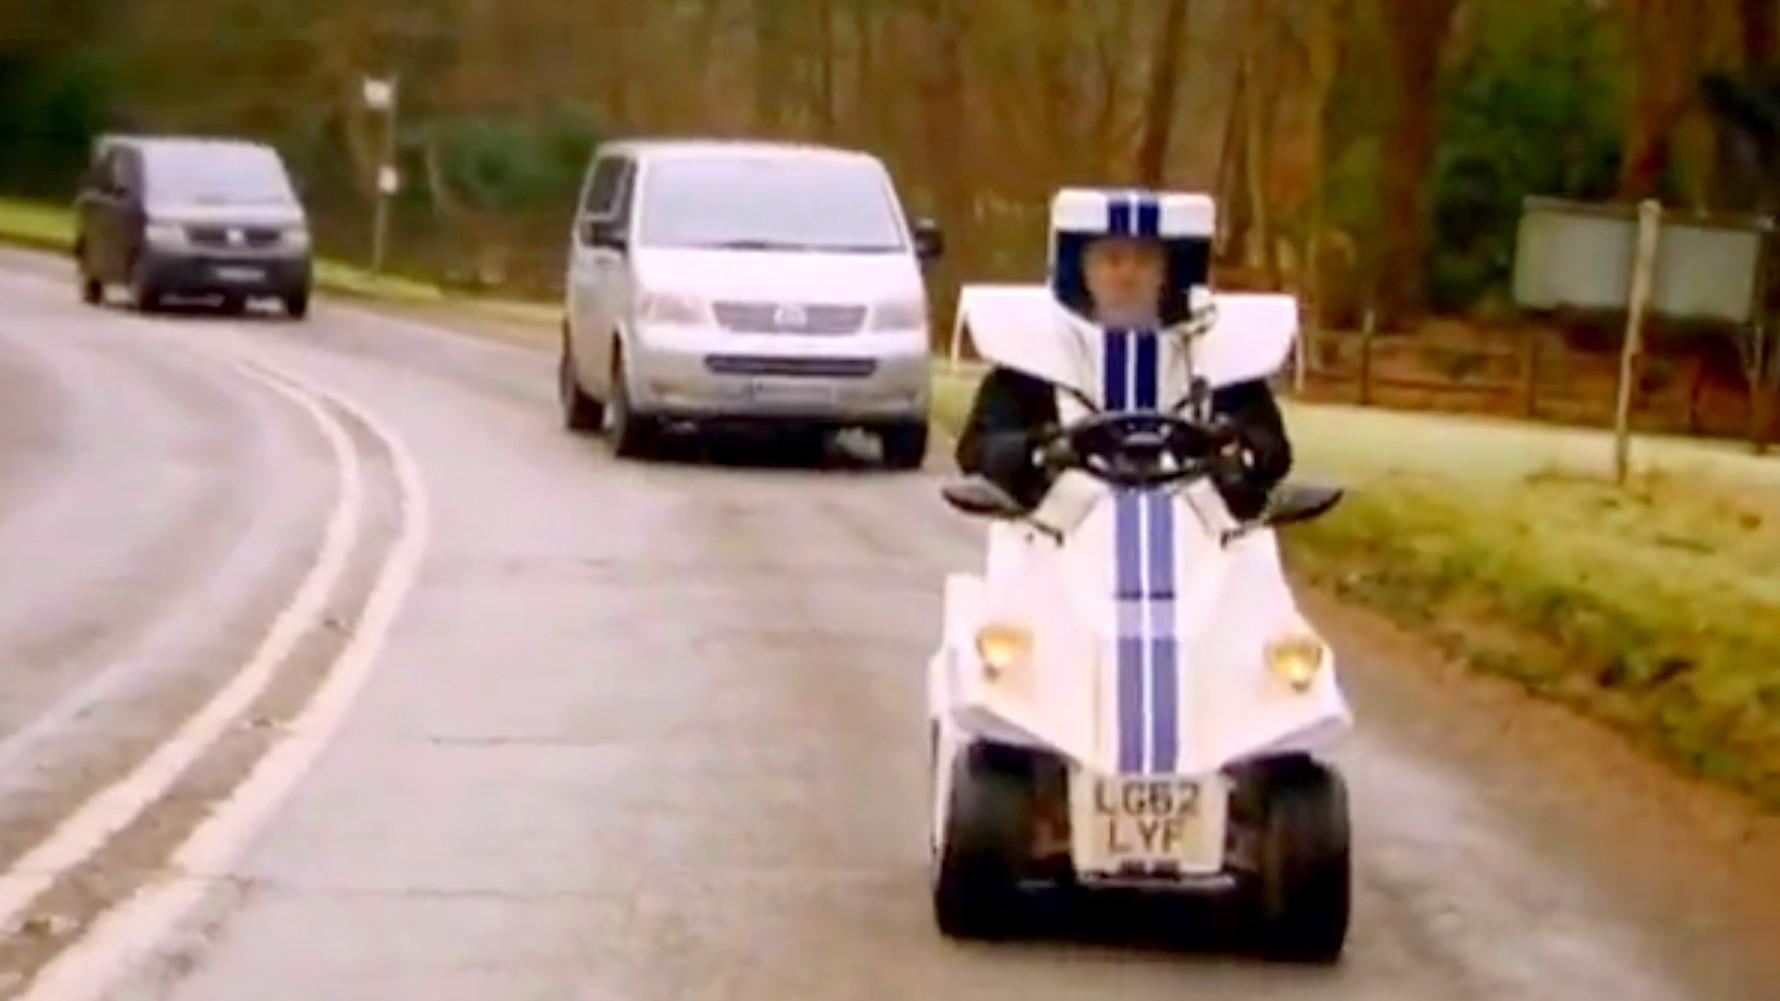 Jeremy Clarkson's P45 on Top Gear [Image: BBC]